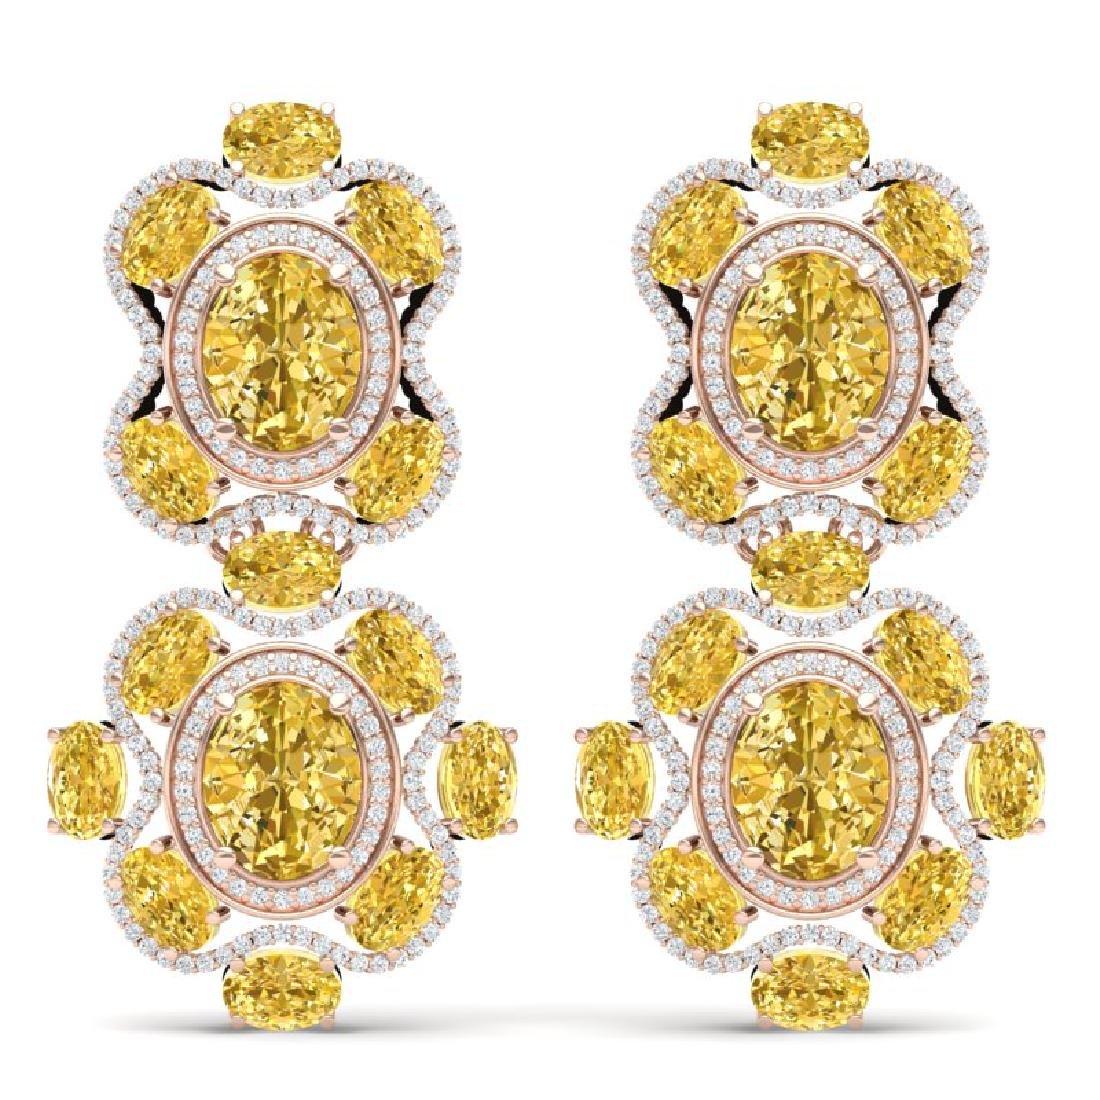 29.21 CTW Royalty Canary Citrine & VS Diamond Earrings